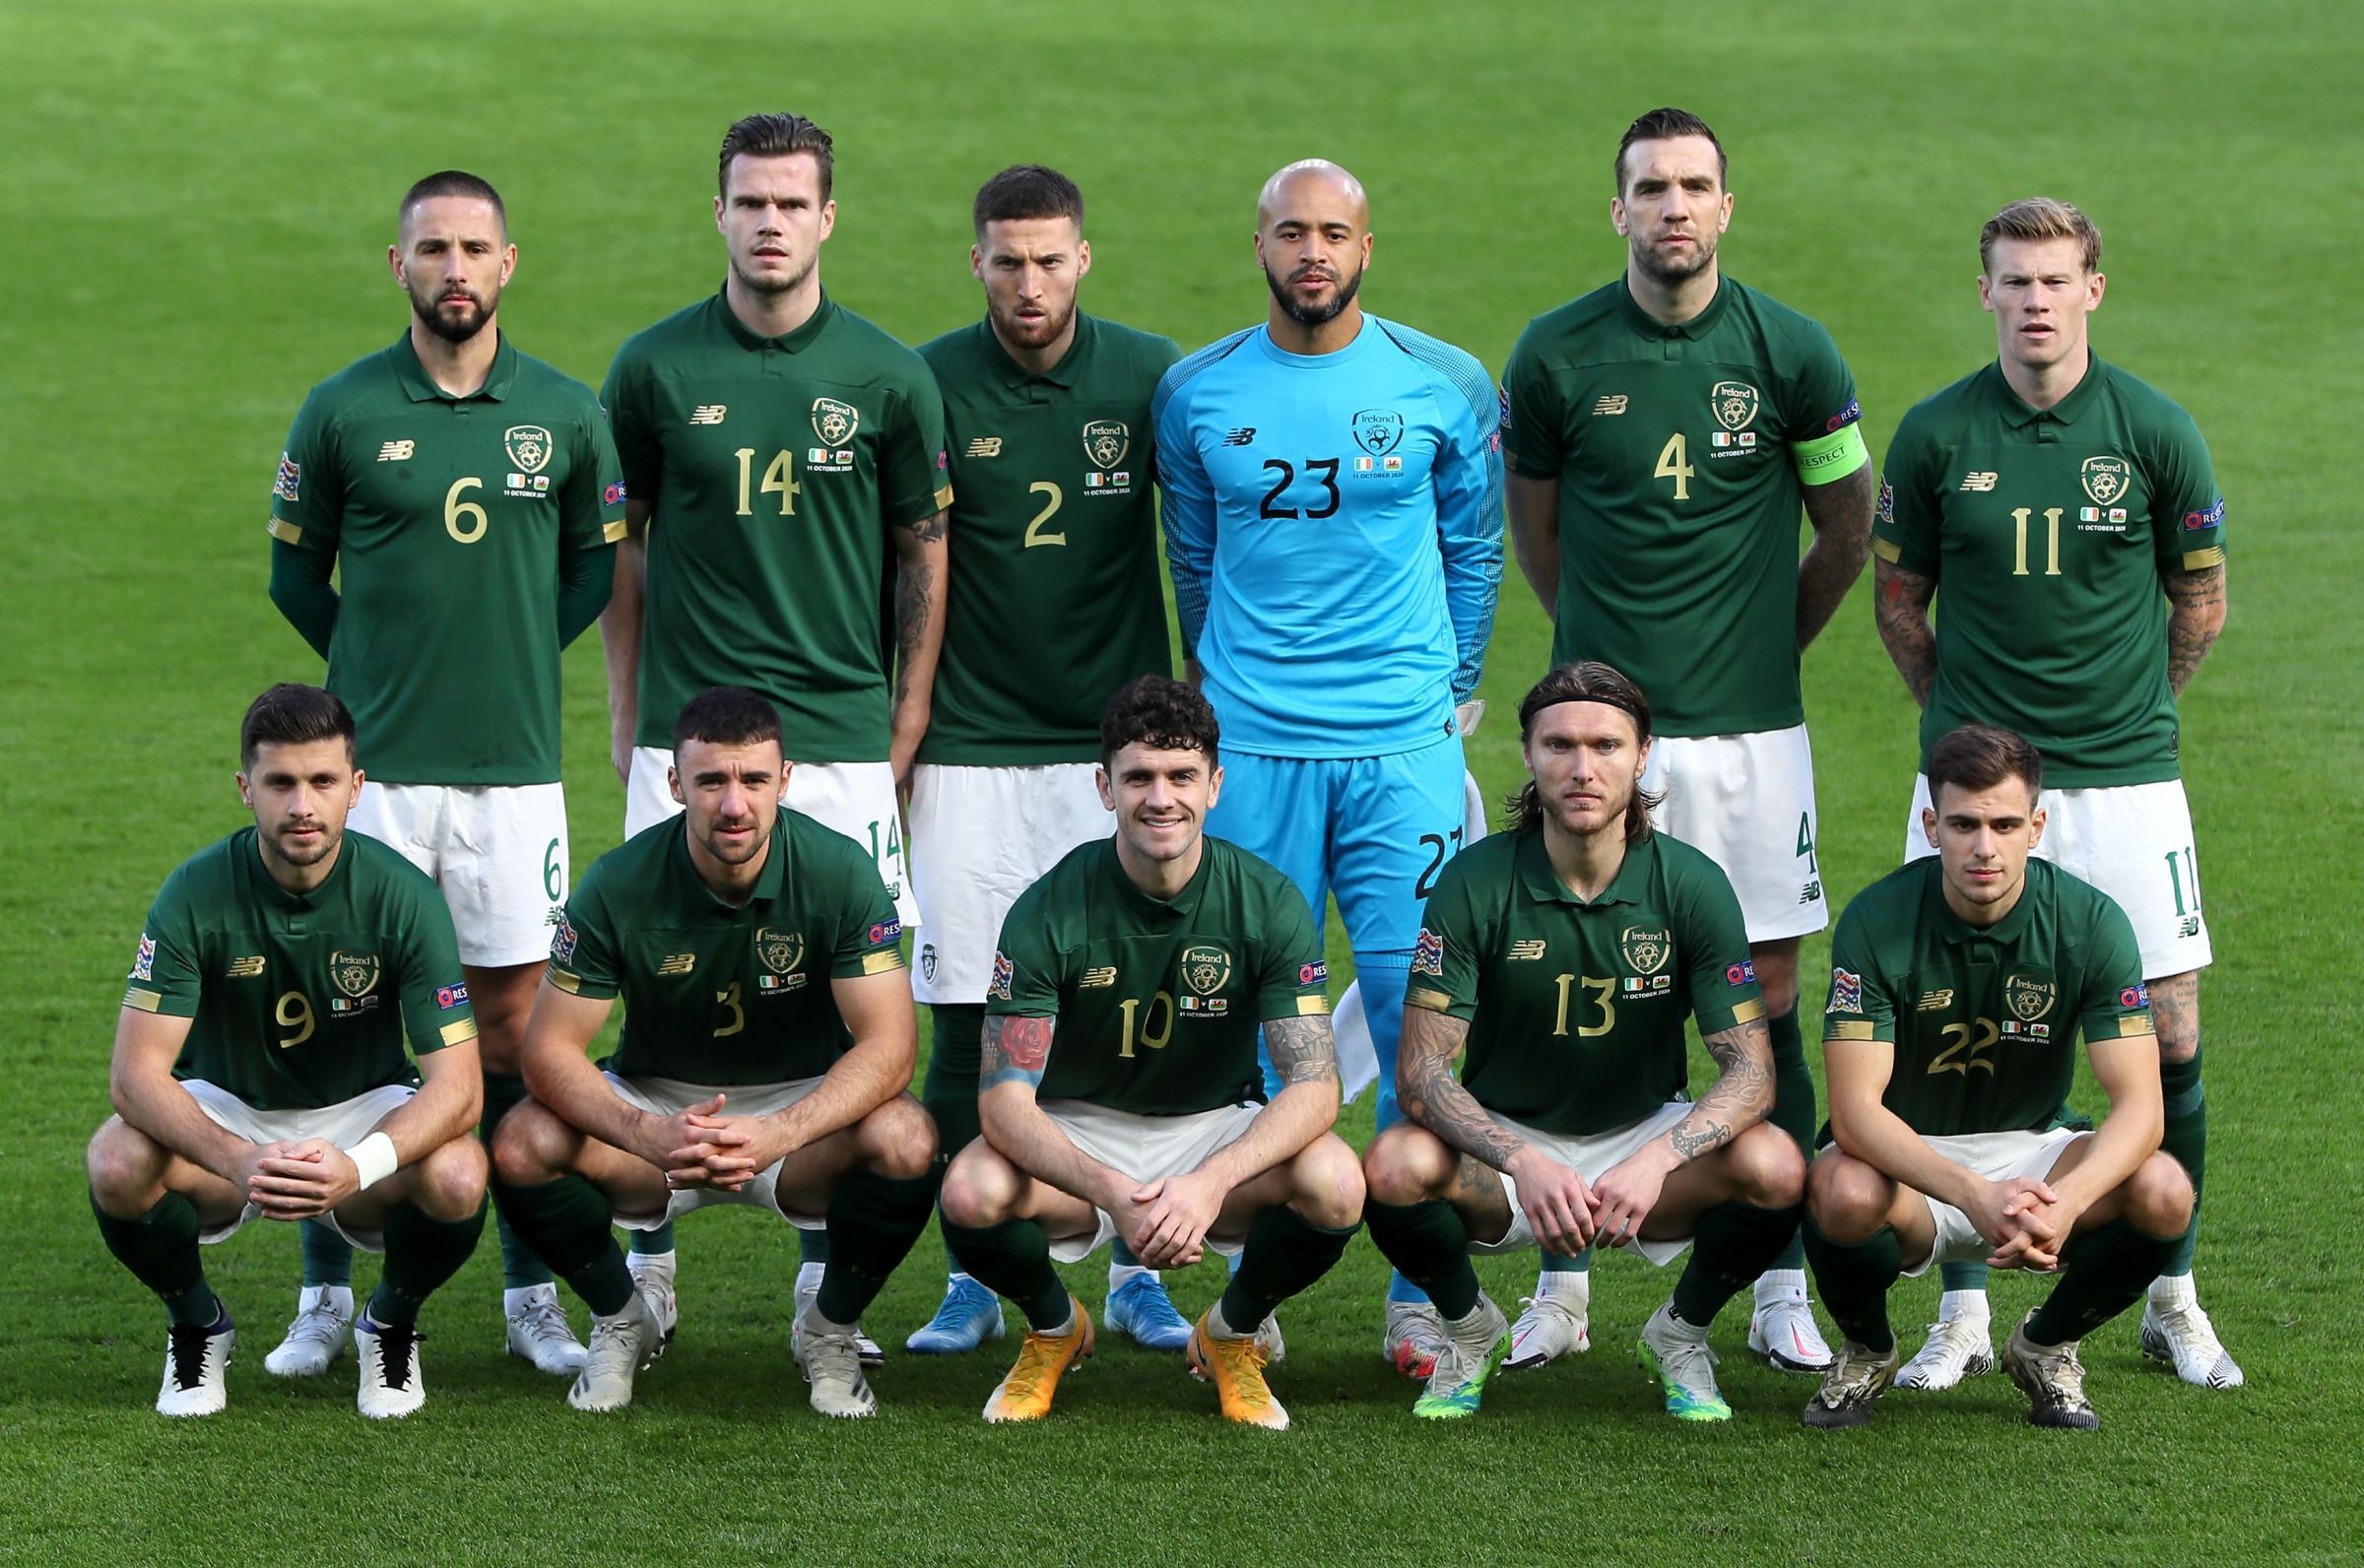 Molumby thanks Irish boss after man-of-the-match display